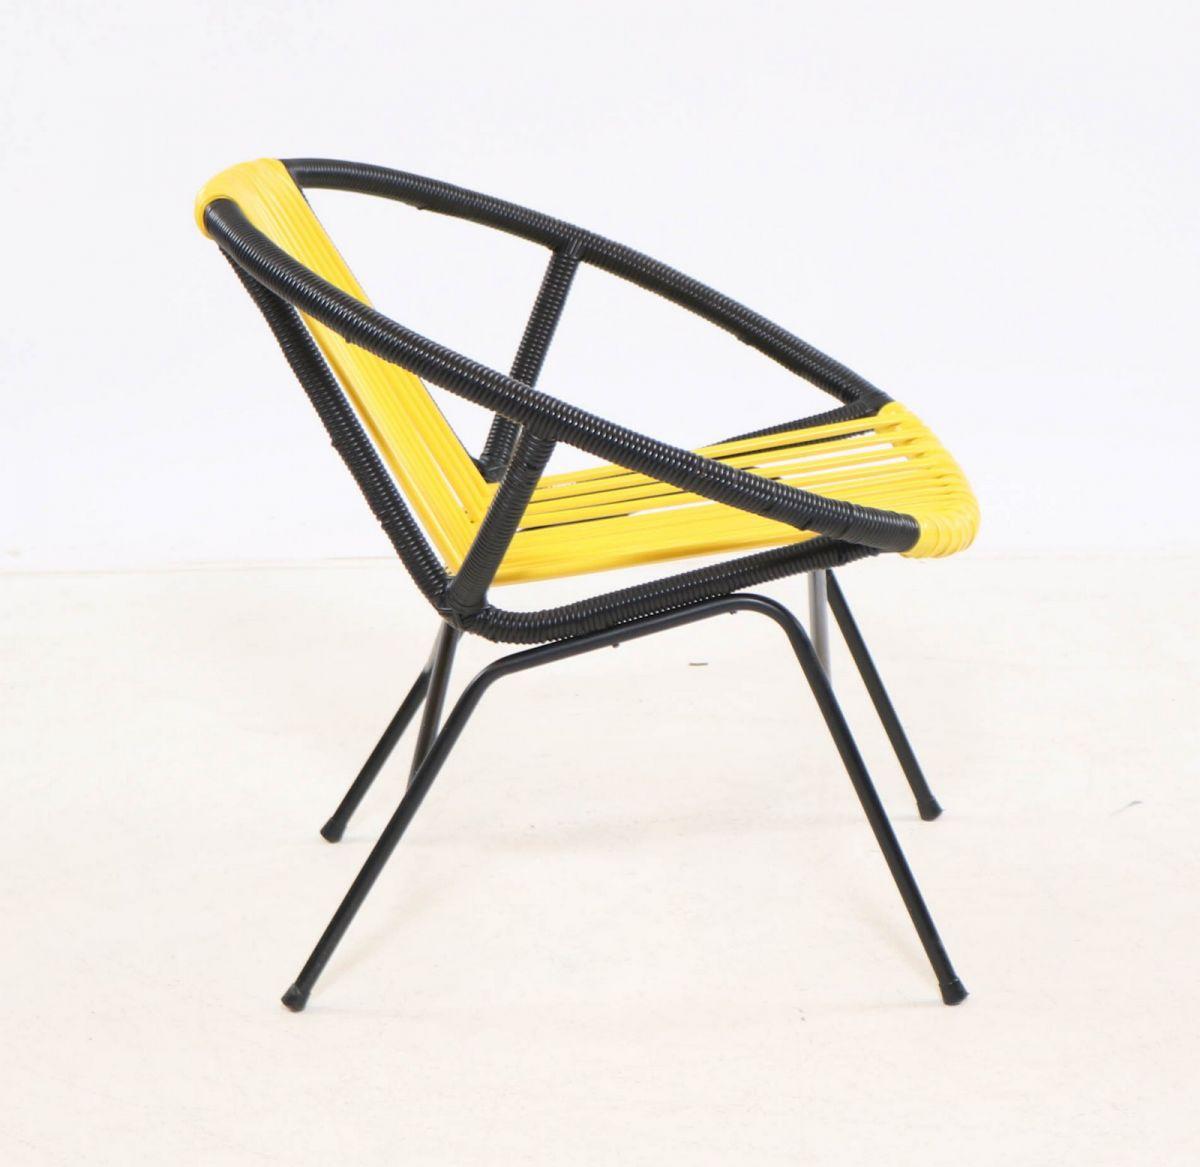 chaise design jaune luckyfind. Black Bedroom Furniture Sets. Home Design Ideas